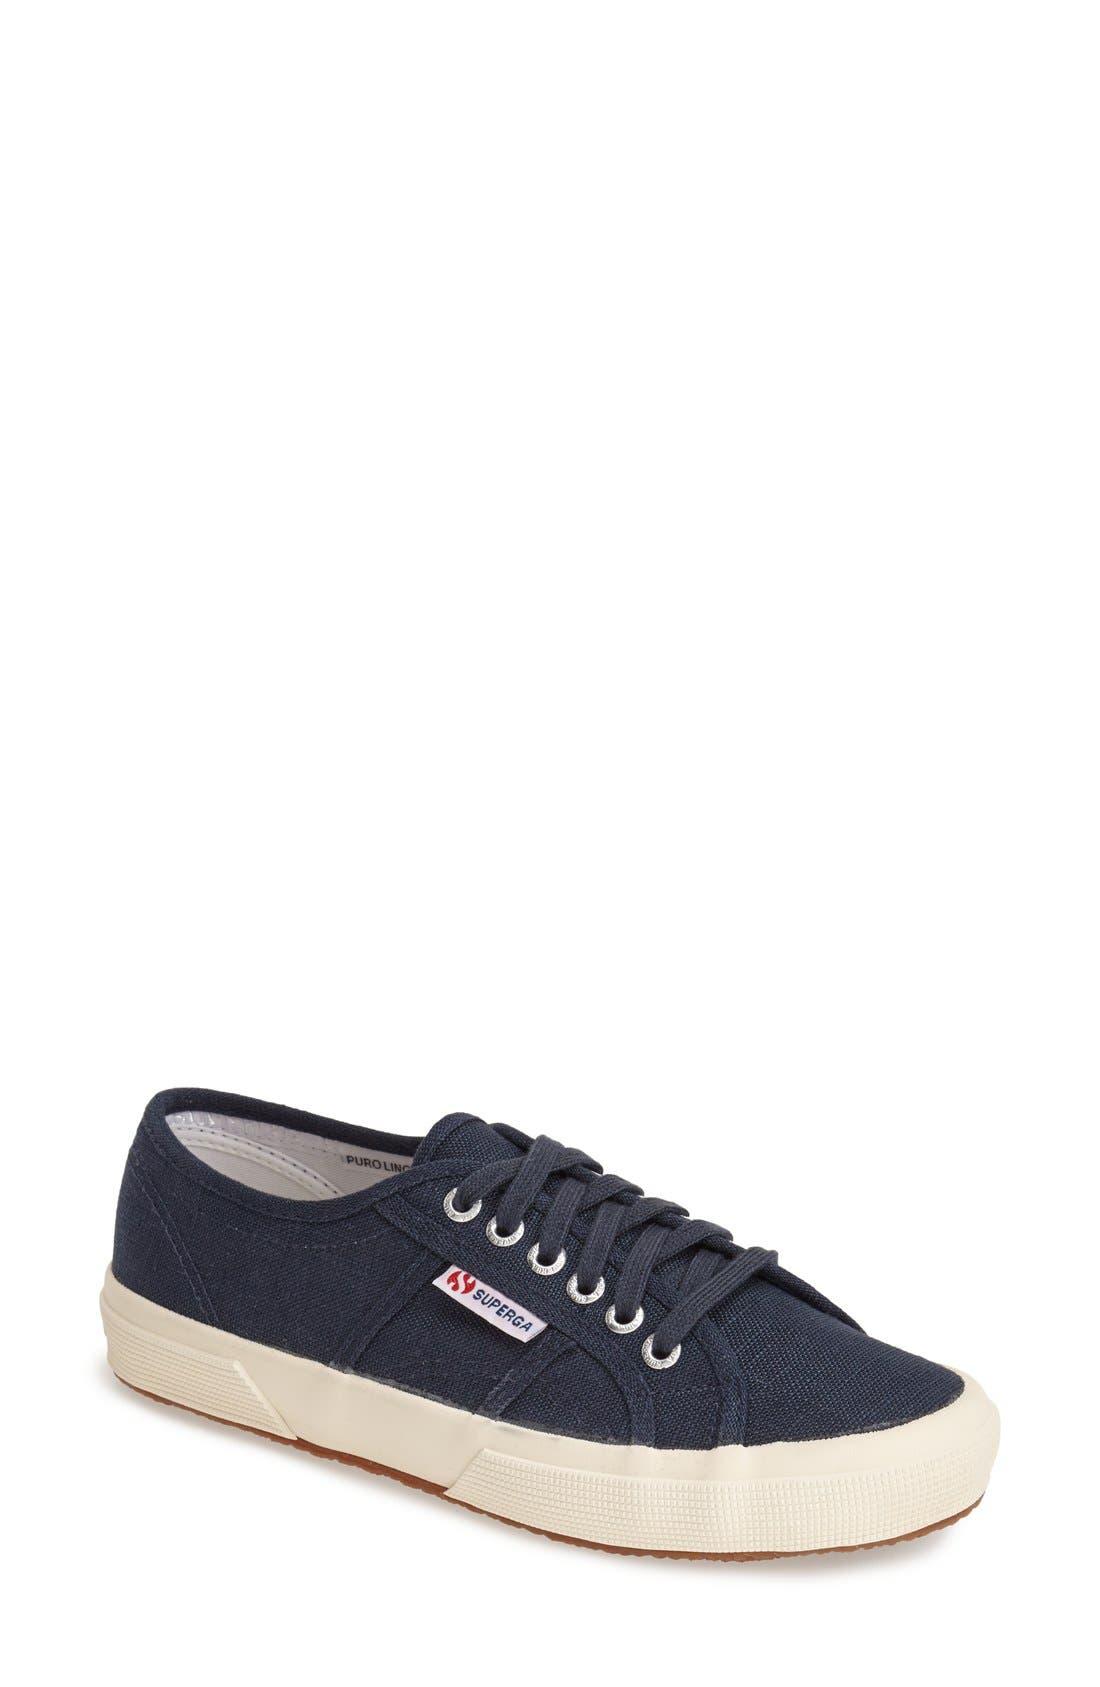 Main Image - Superga 'Linu' Linen Sneaker (Women)